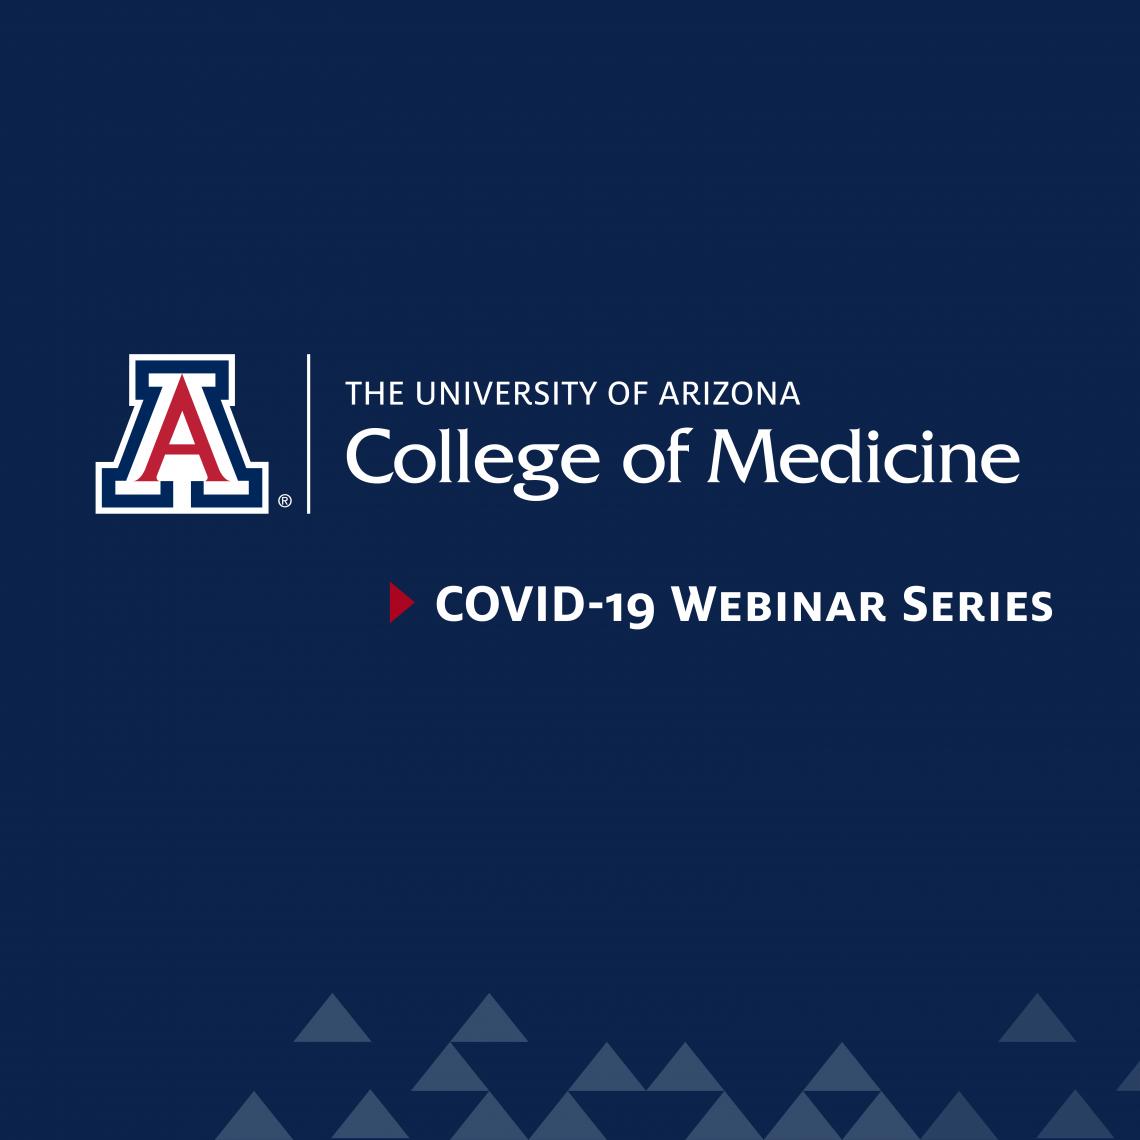 College of Medicine Webinar